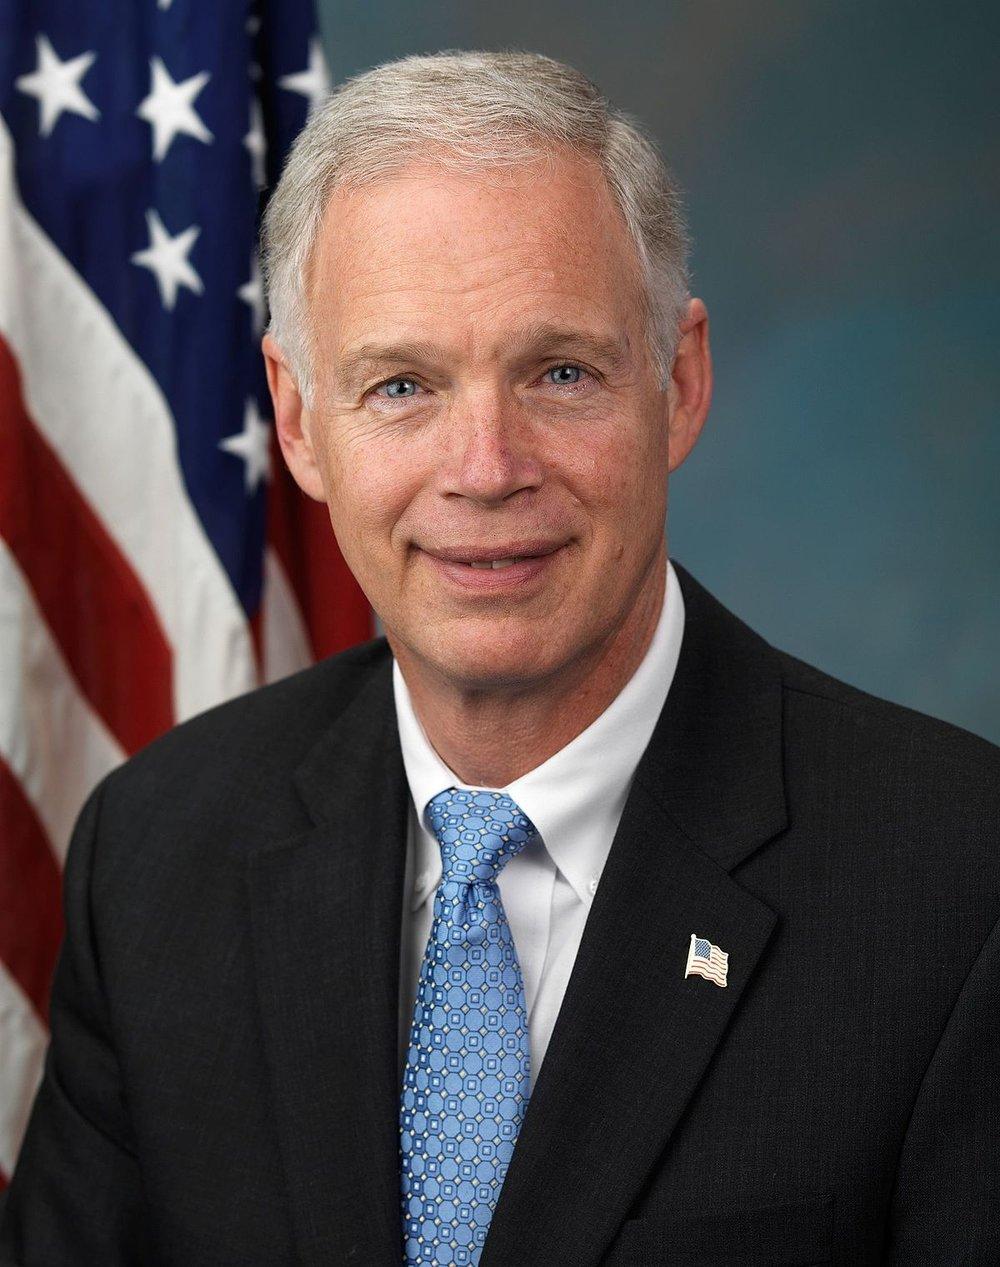 Sen Ron_Johnson,_official_portrait,_112th_Congress.jpg